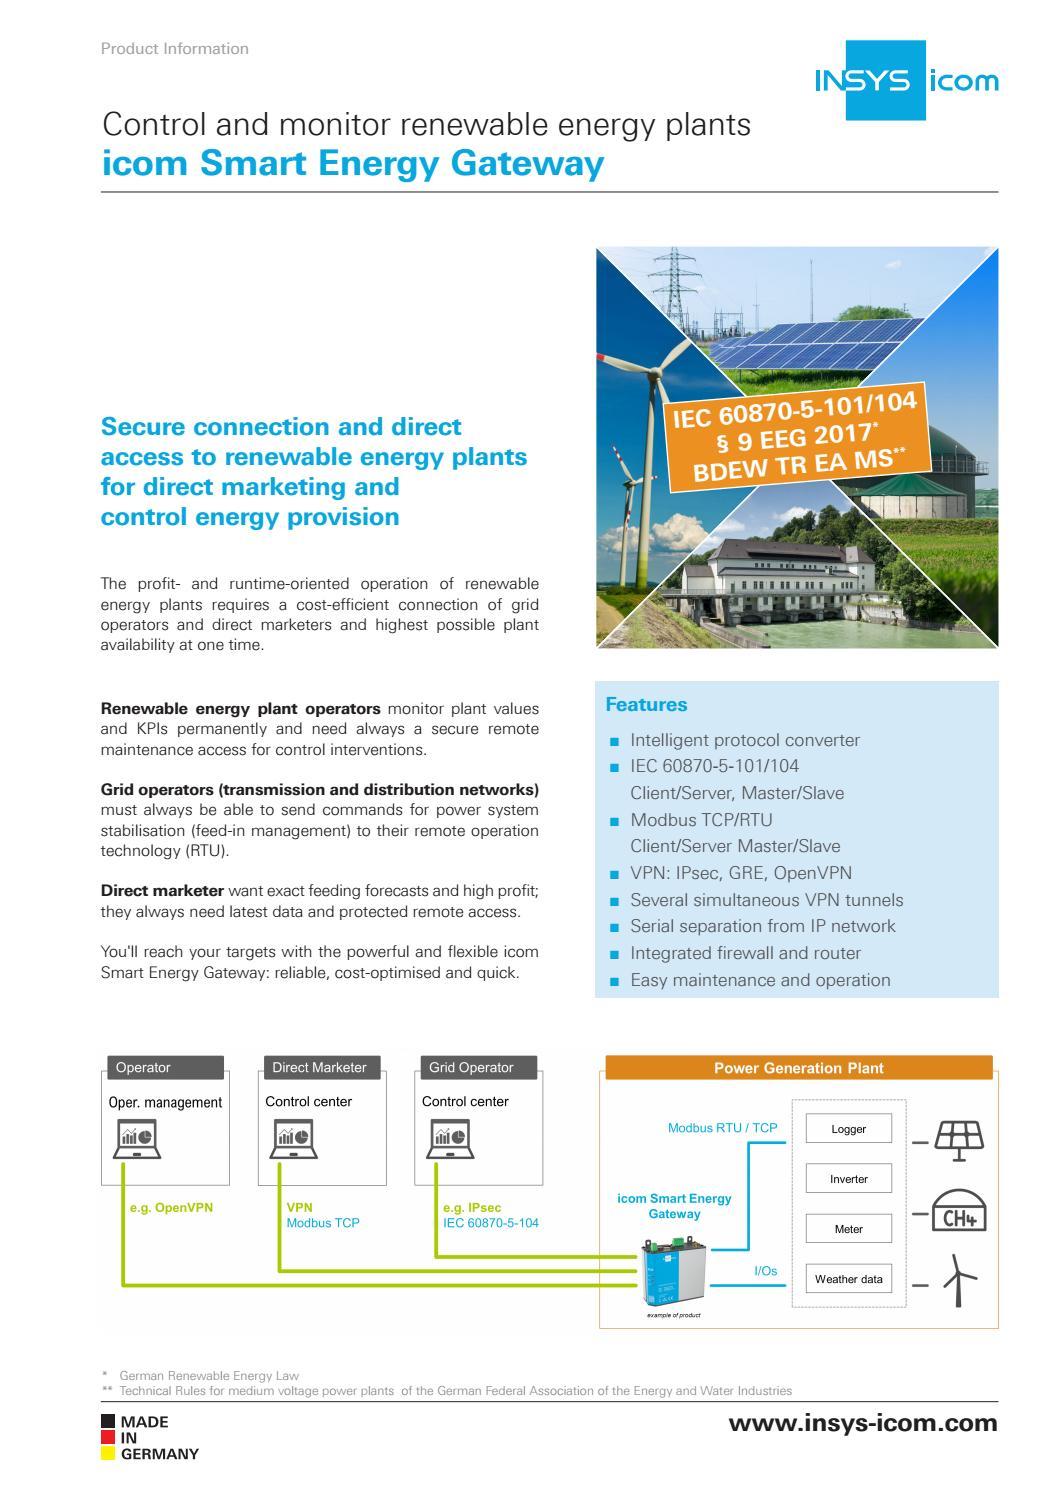 icom Smart Energy Gateway – renewable energy plants by INSYS